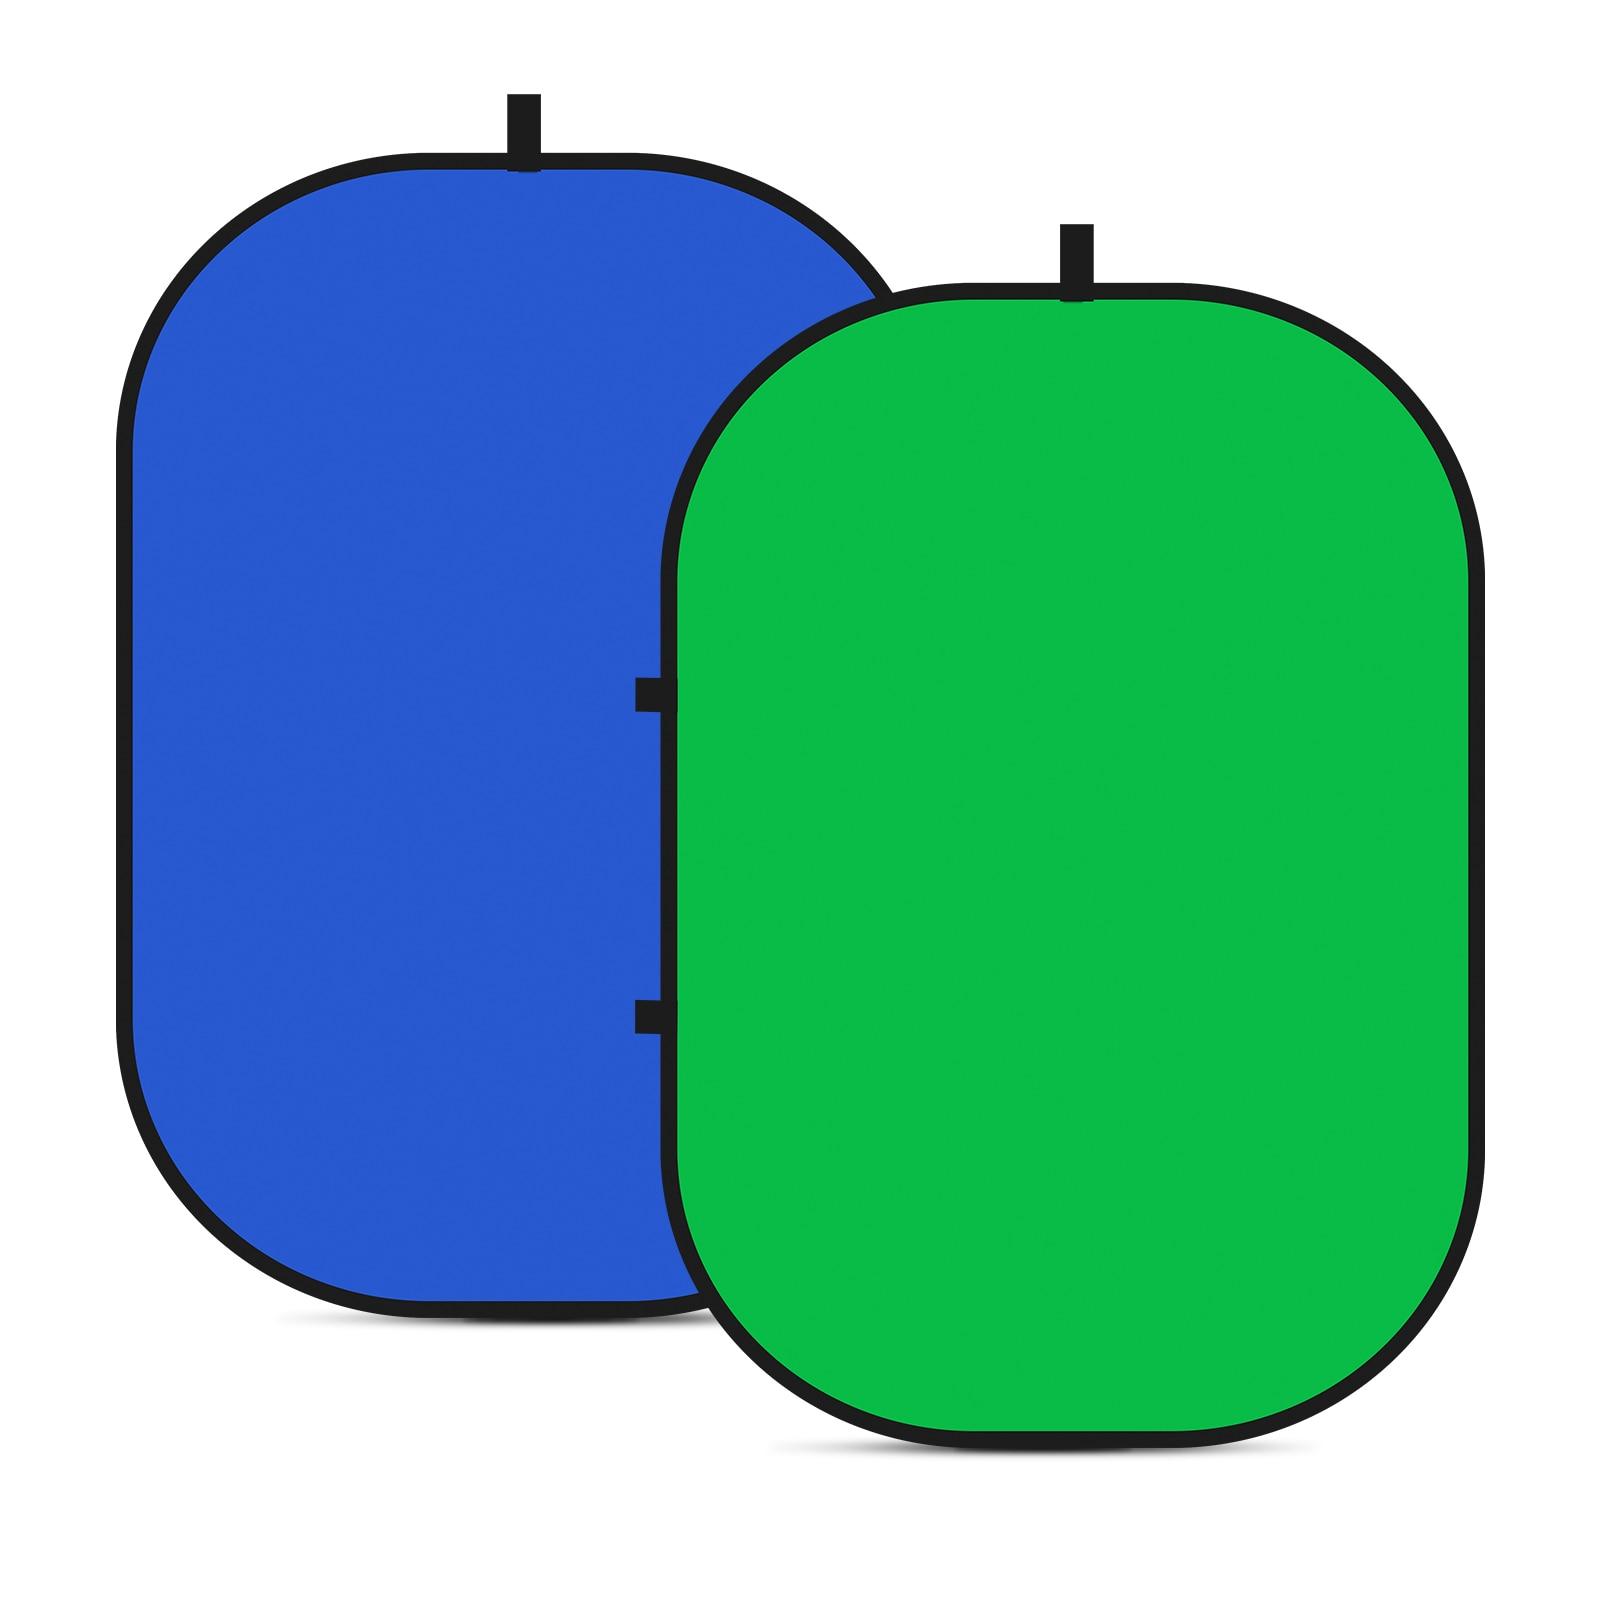 Neewer 2-في-1 Chromakey الأخضر Chromakey الأزرق لطي خلفية لطي عكسها خلفية 5x7 قدم/ 1.5x2 متر